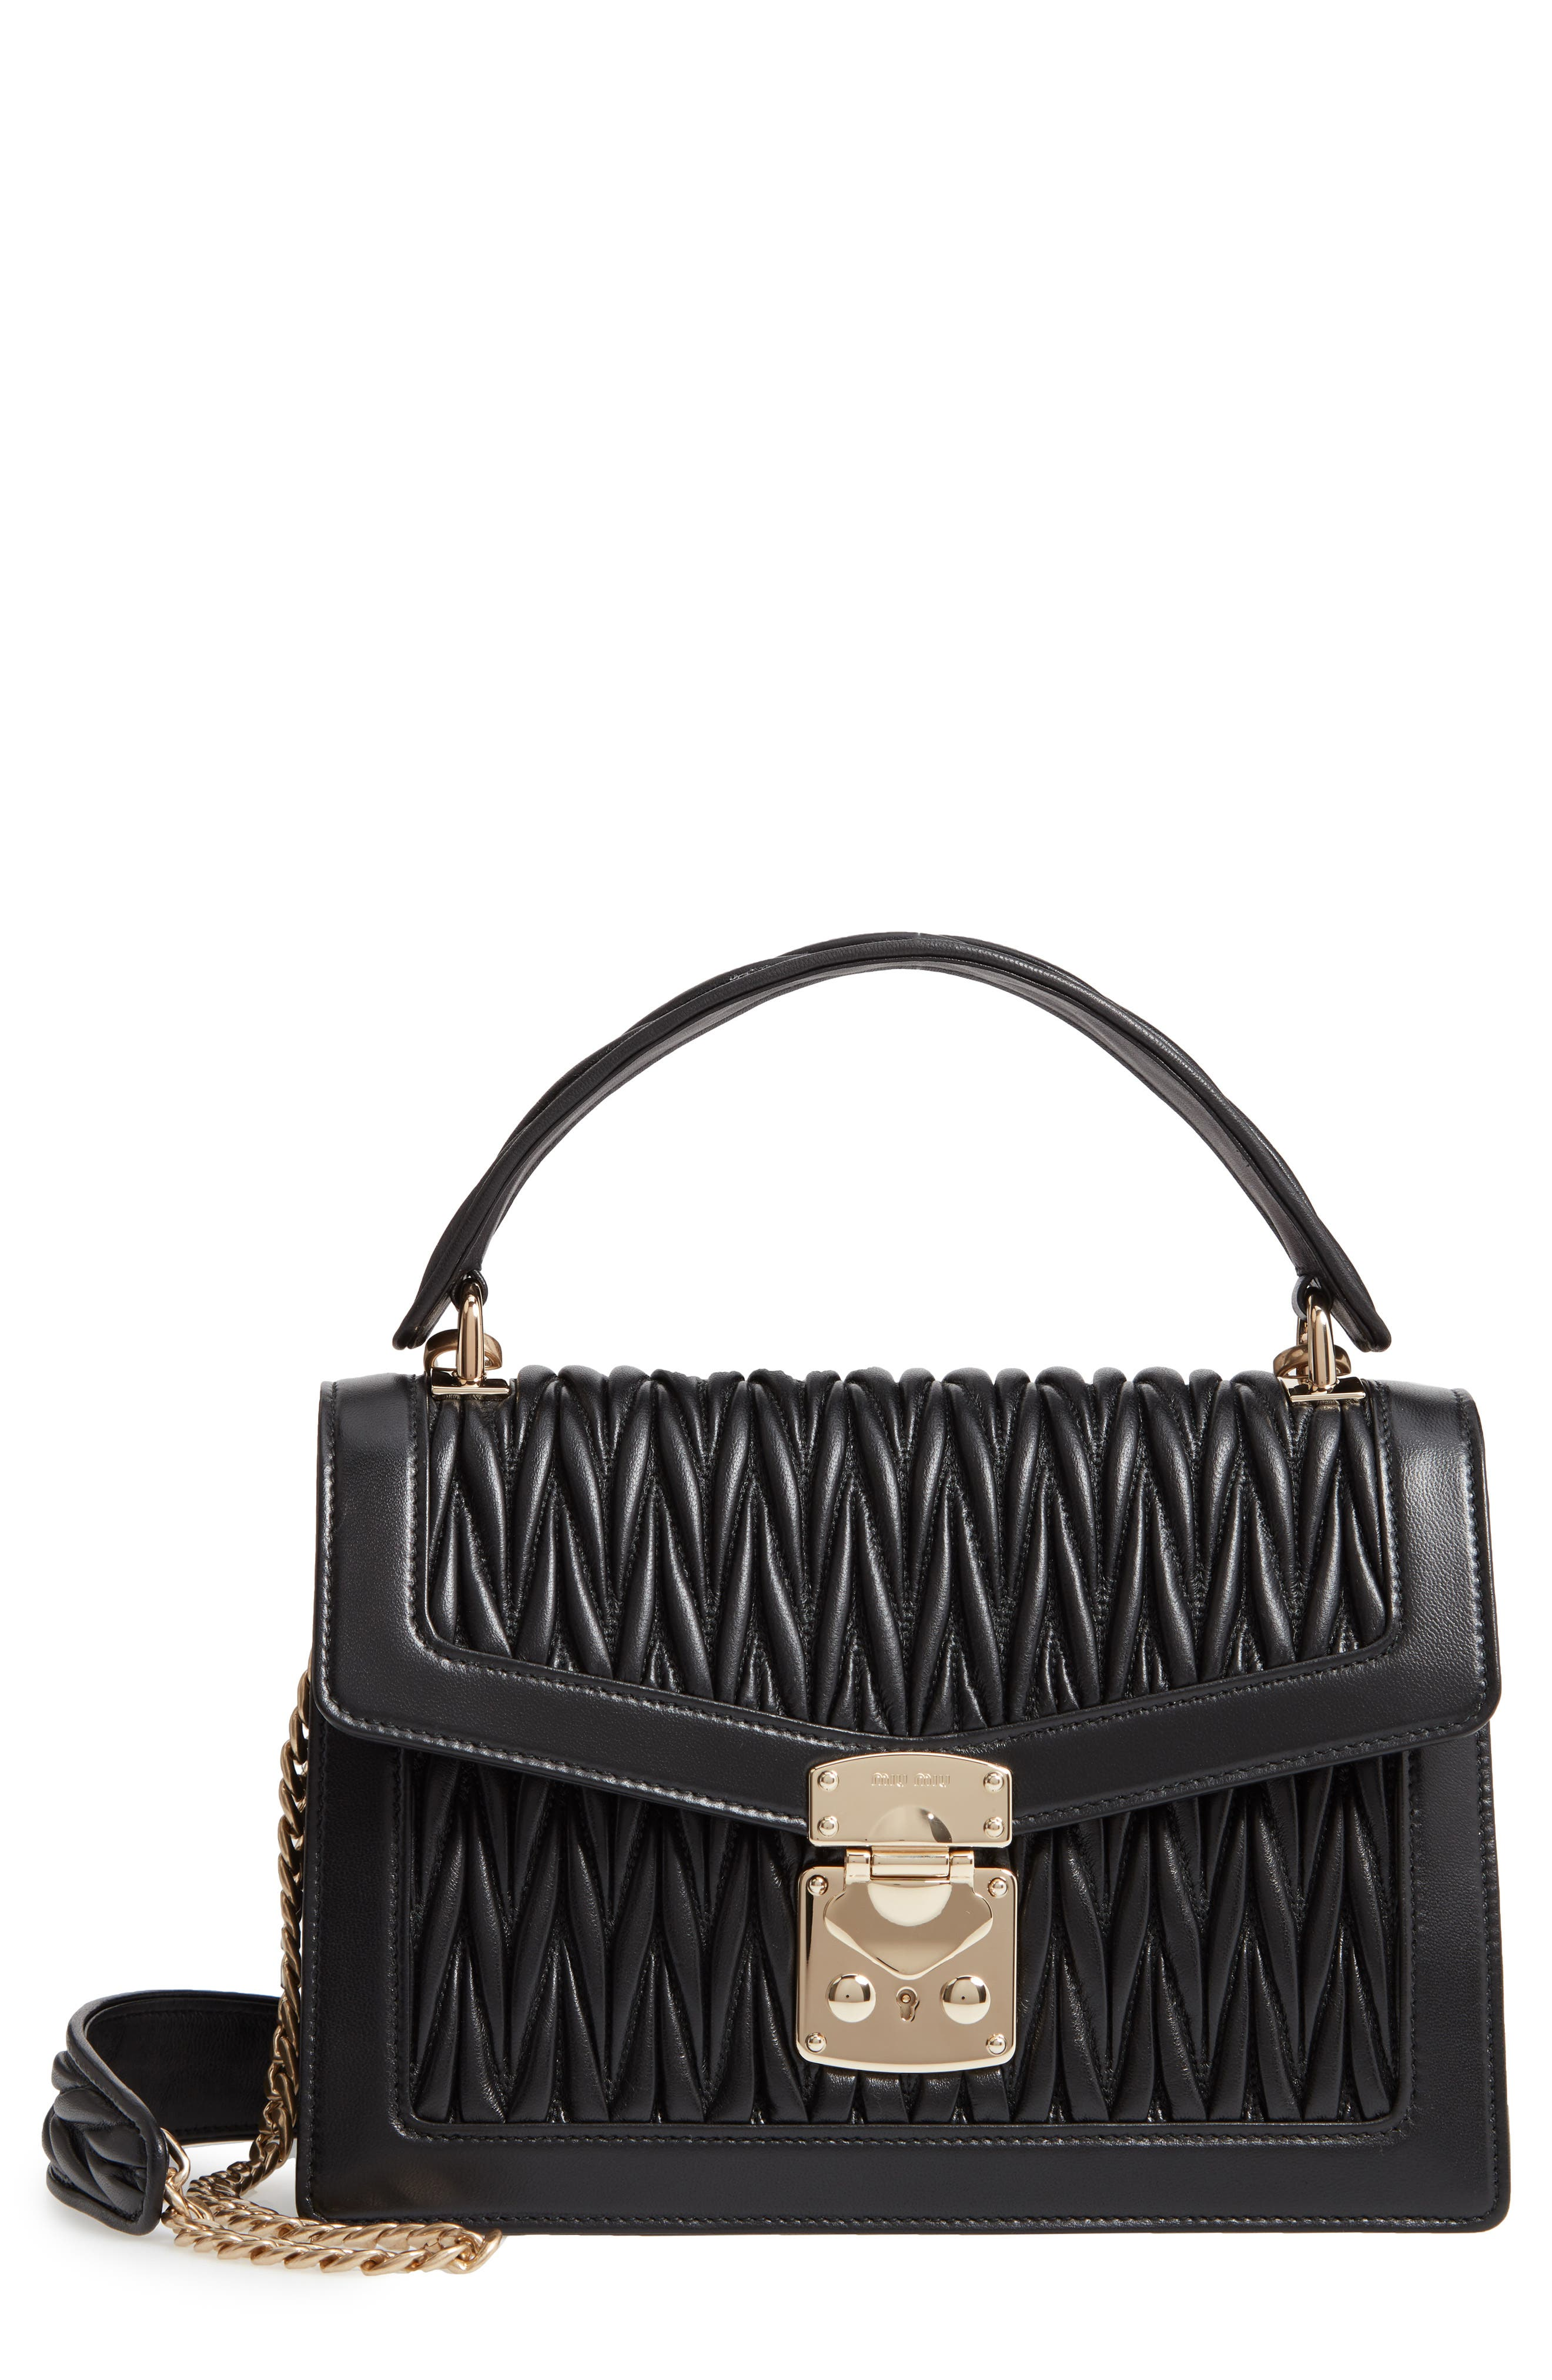 a2d5d205cfe6 Miu Miu Confidential Matelasse Quilted Lambskin Leather Top Handle Bag -